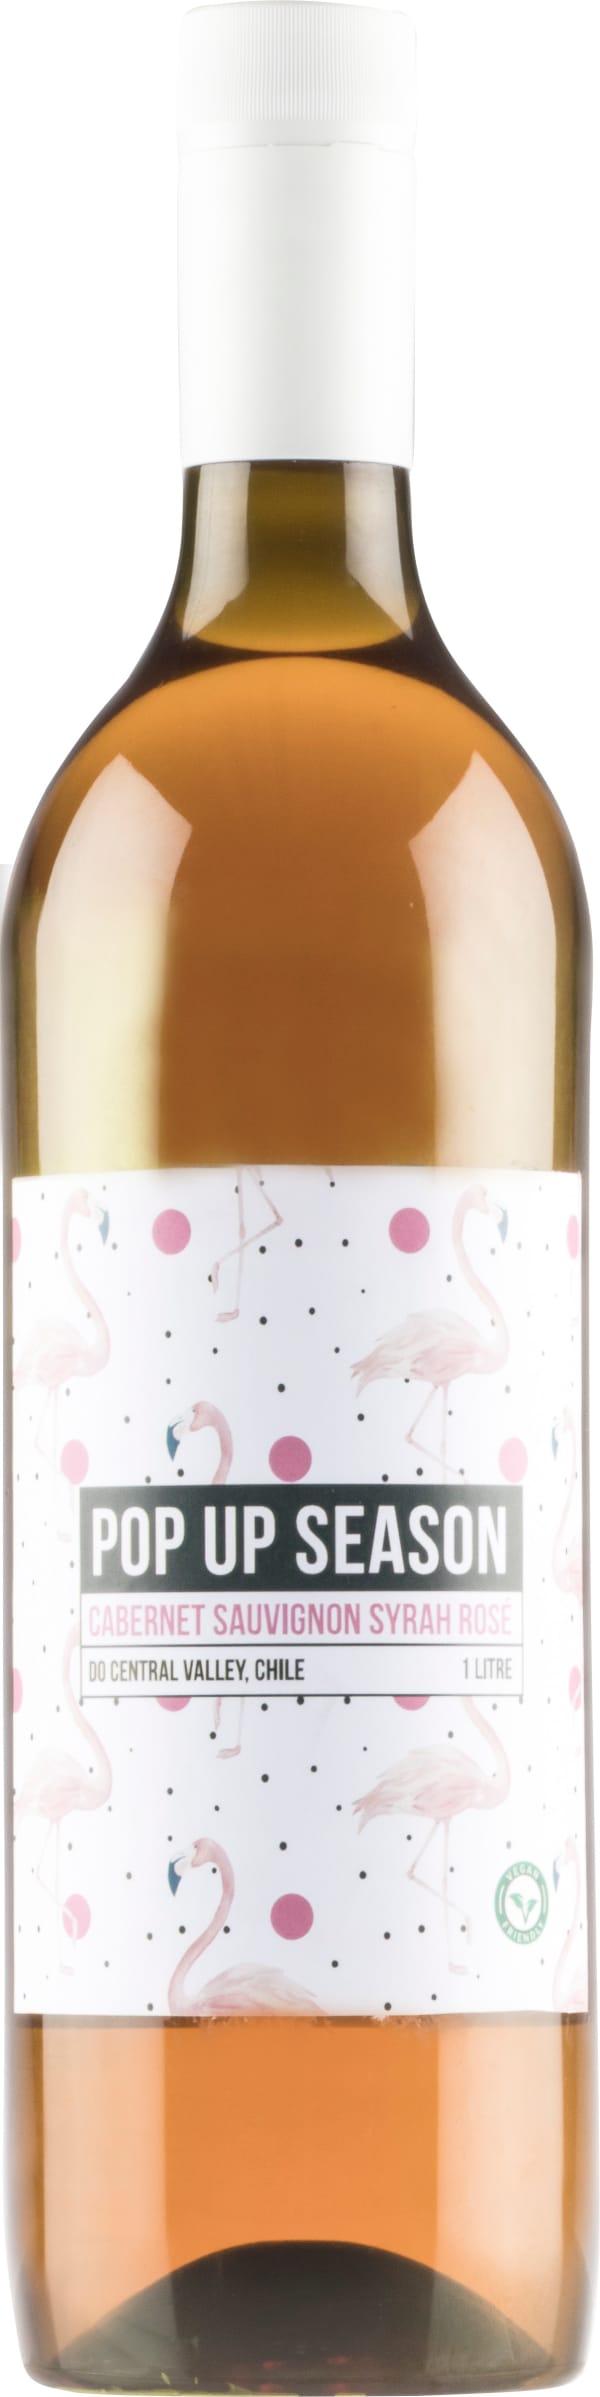 Pop Up Season Cabernet Sauvignon Syrah Rosé  2018 plastflaska